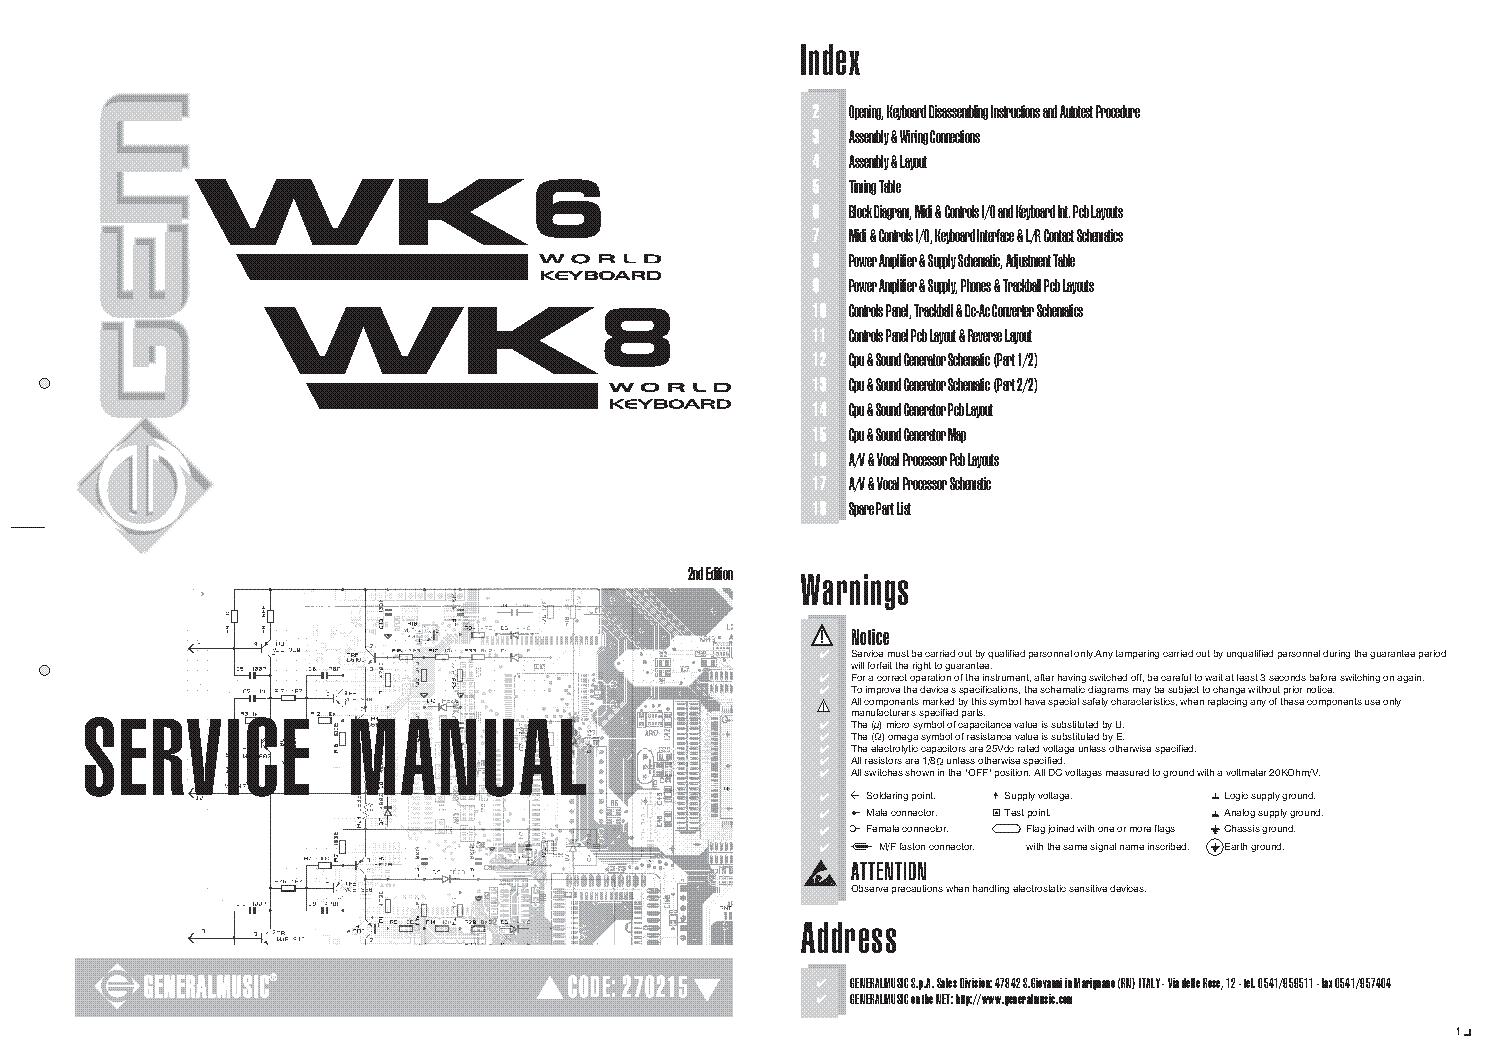 gem wk6 wk8 sm service manual download schematics eeprom repair rh elektrotanya com gm service manual download gm service manuals free